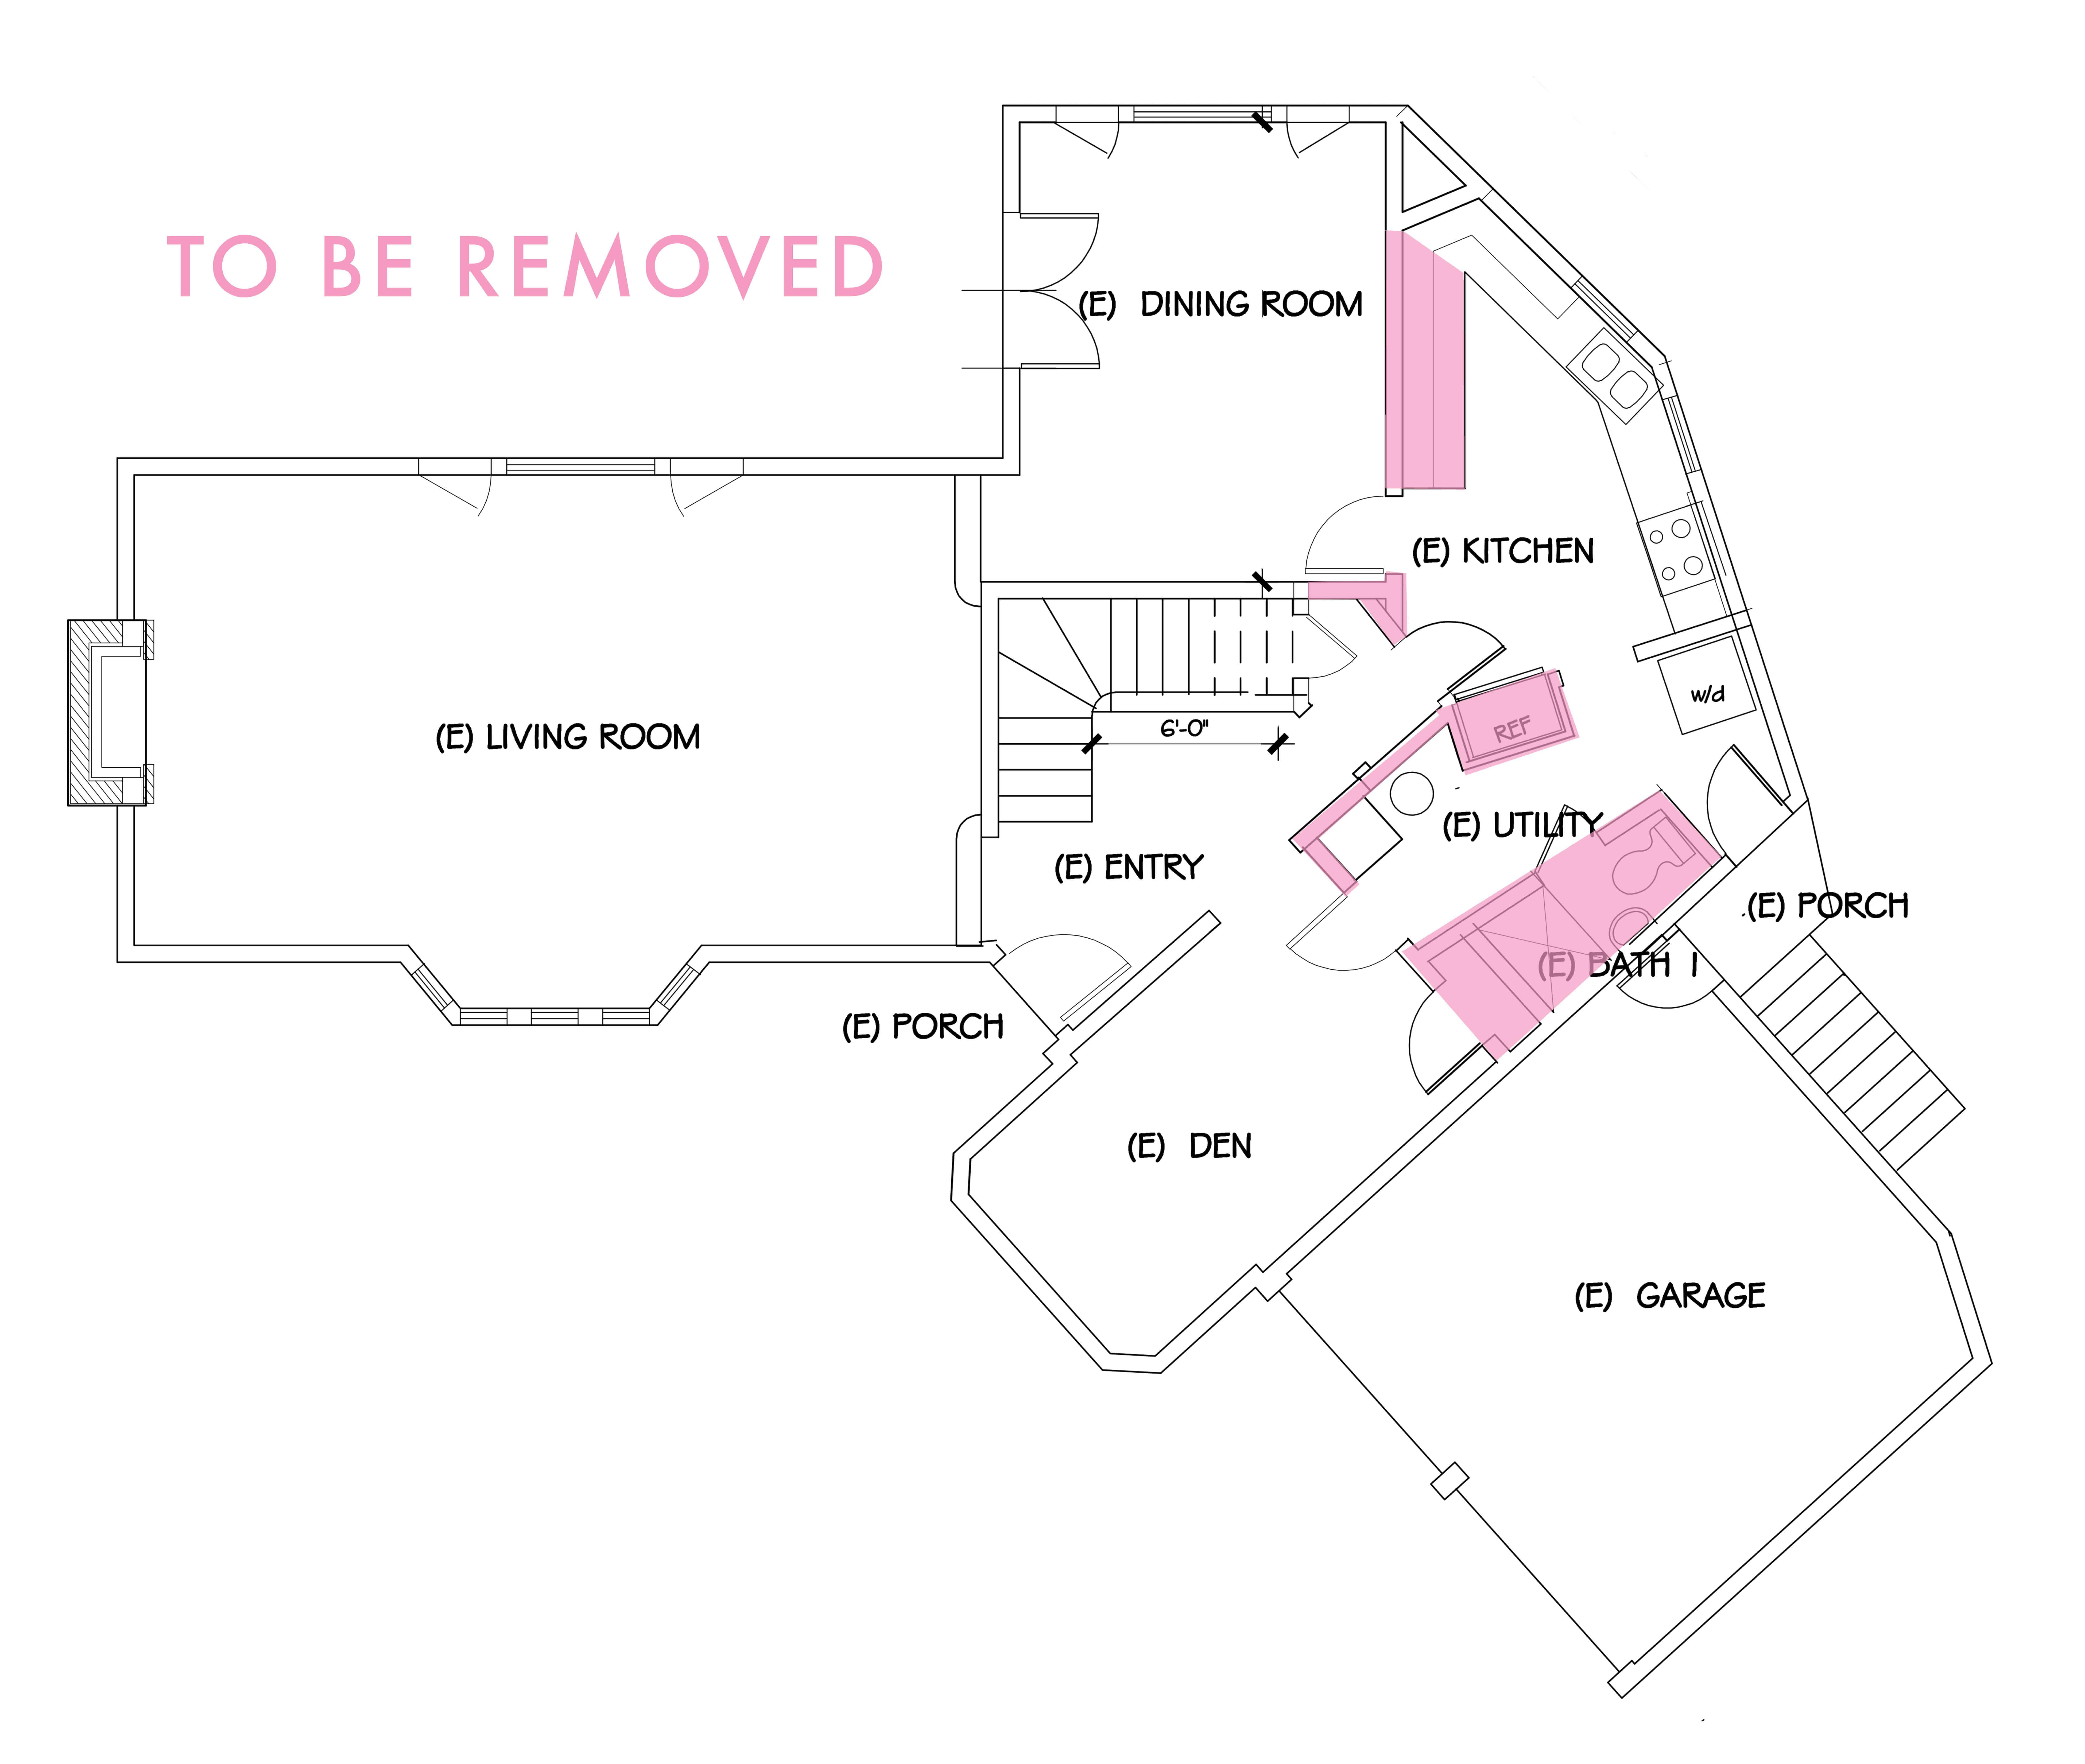 original_floor-plan_revised-floor-plan_to-be-removed_1